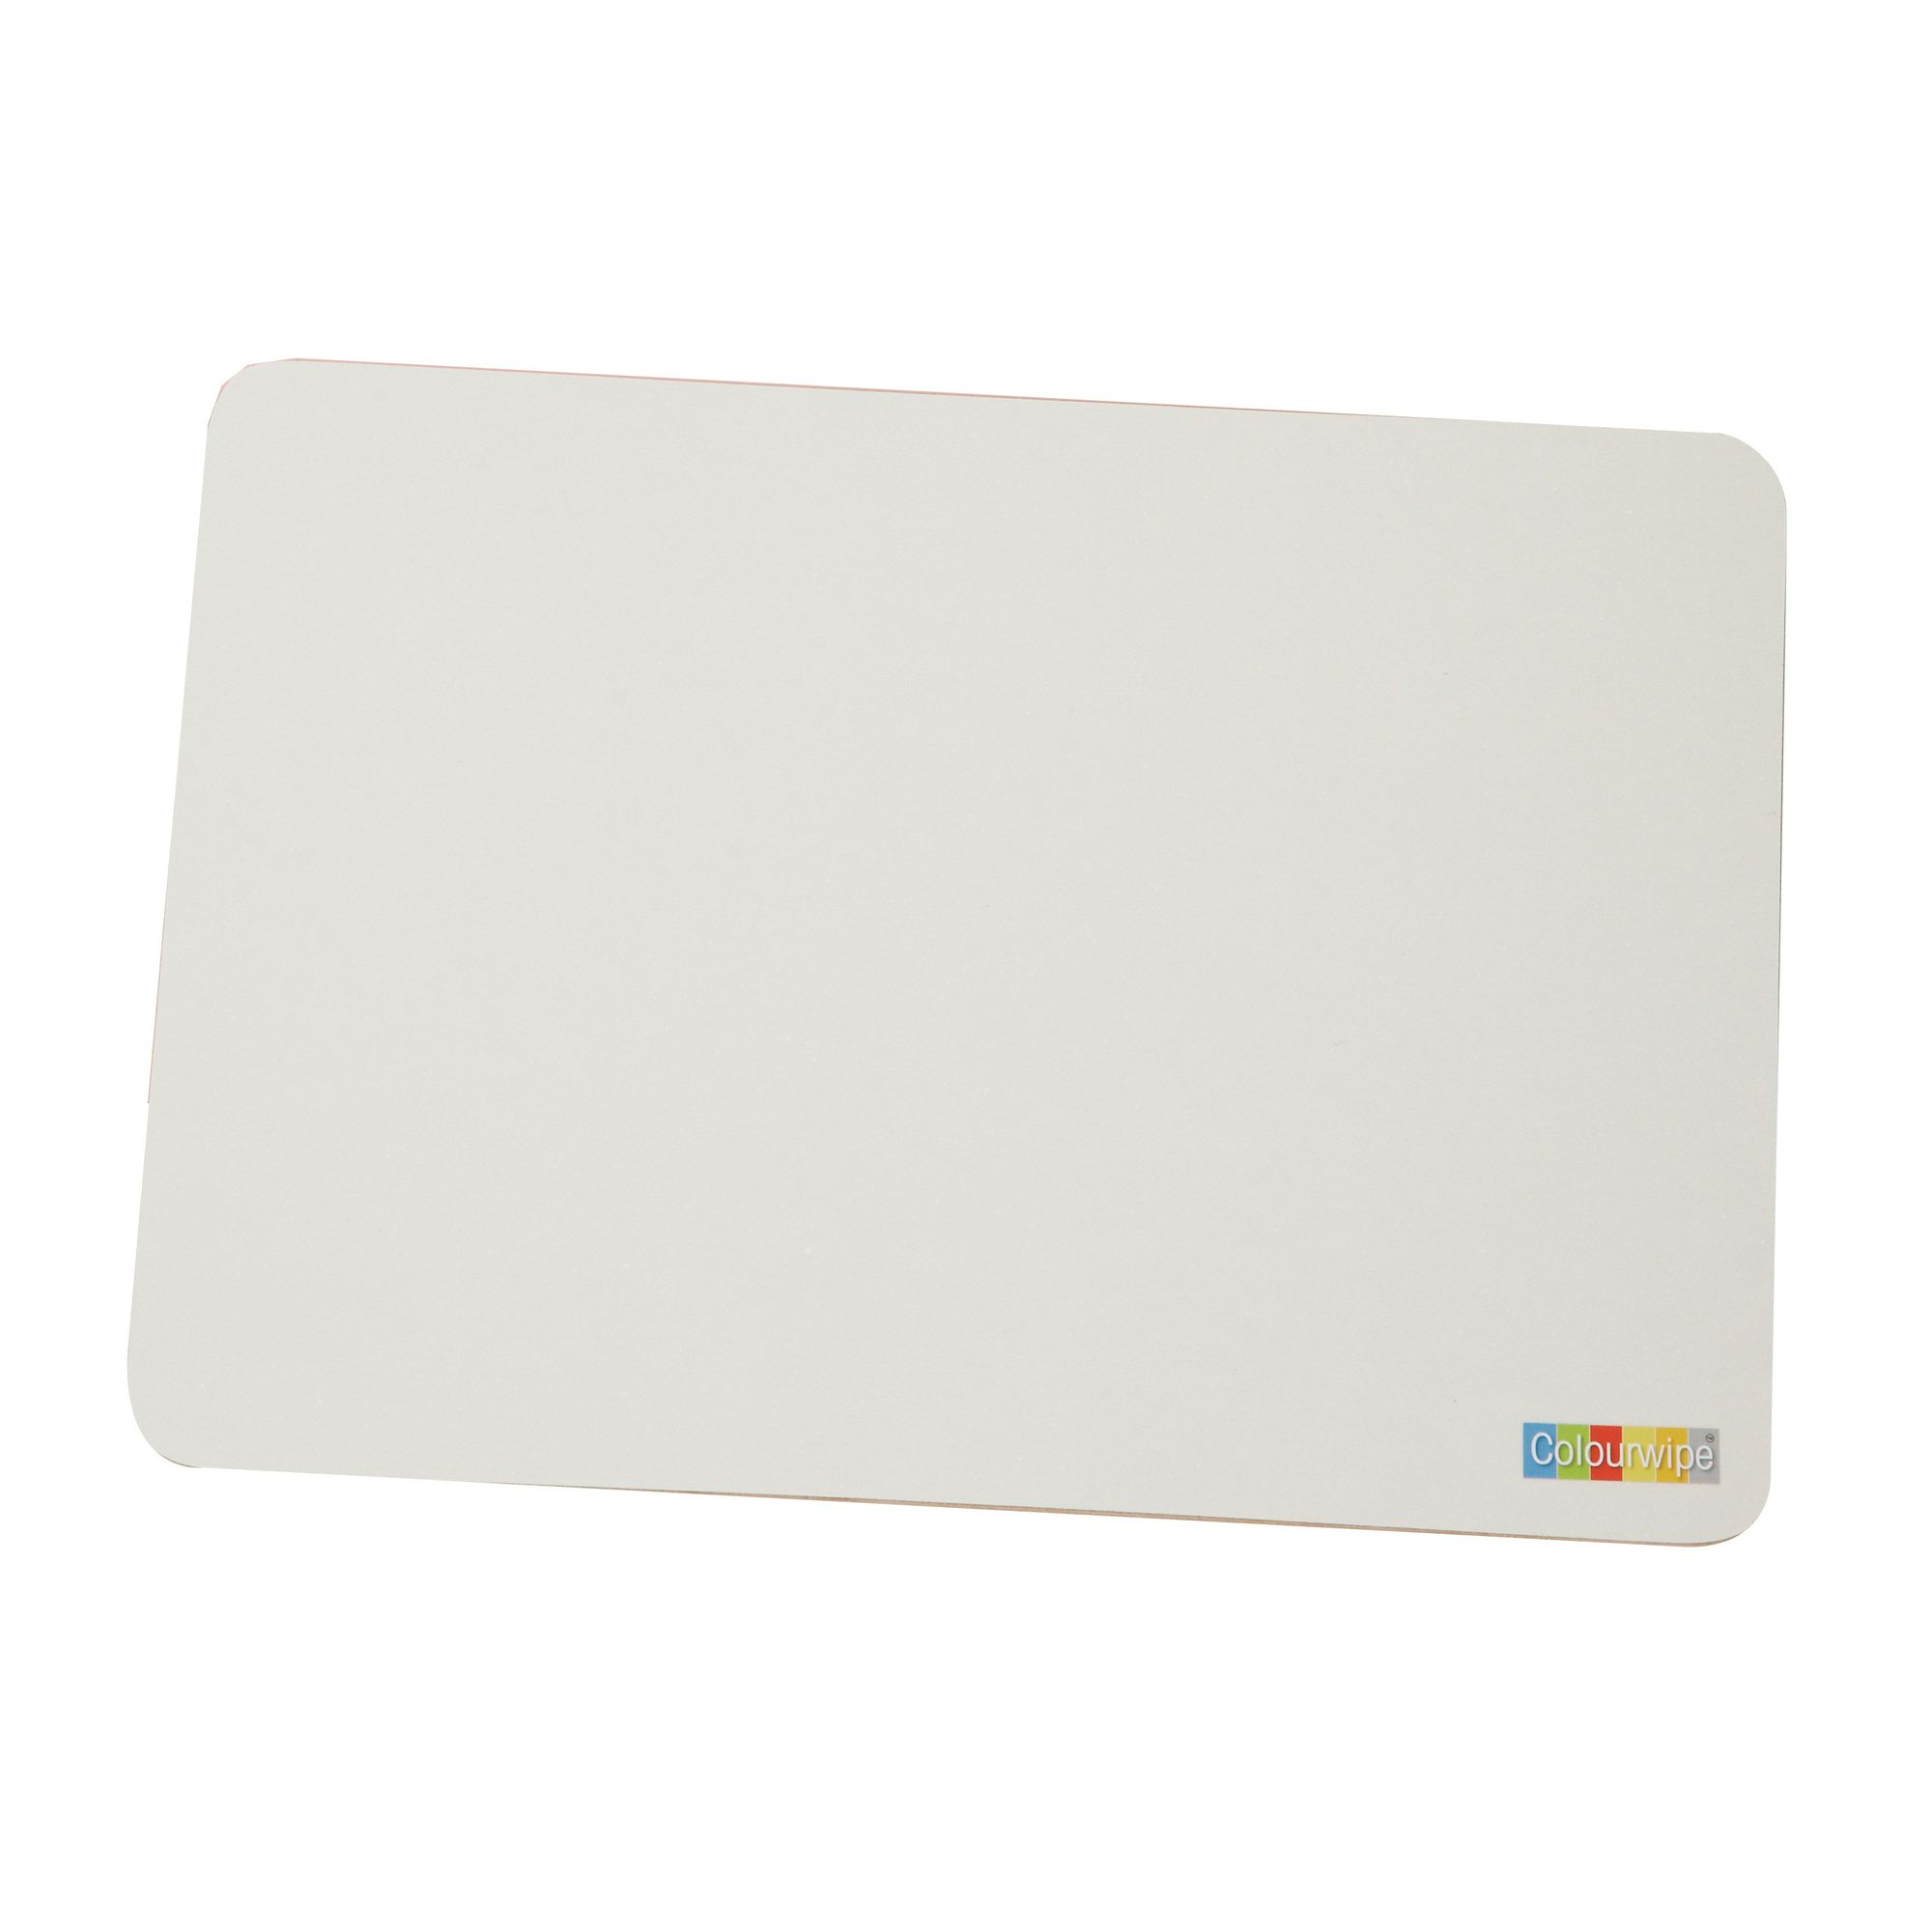 Adboards Colourwipe Board A4 White/White (5) JUCL-05A4-99